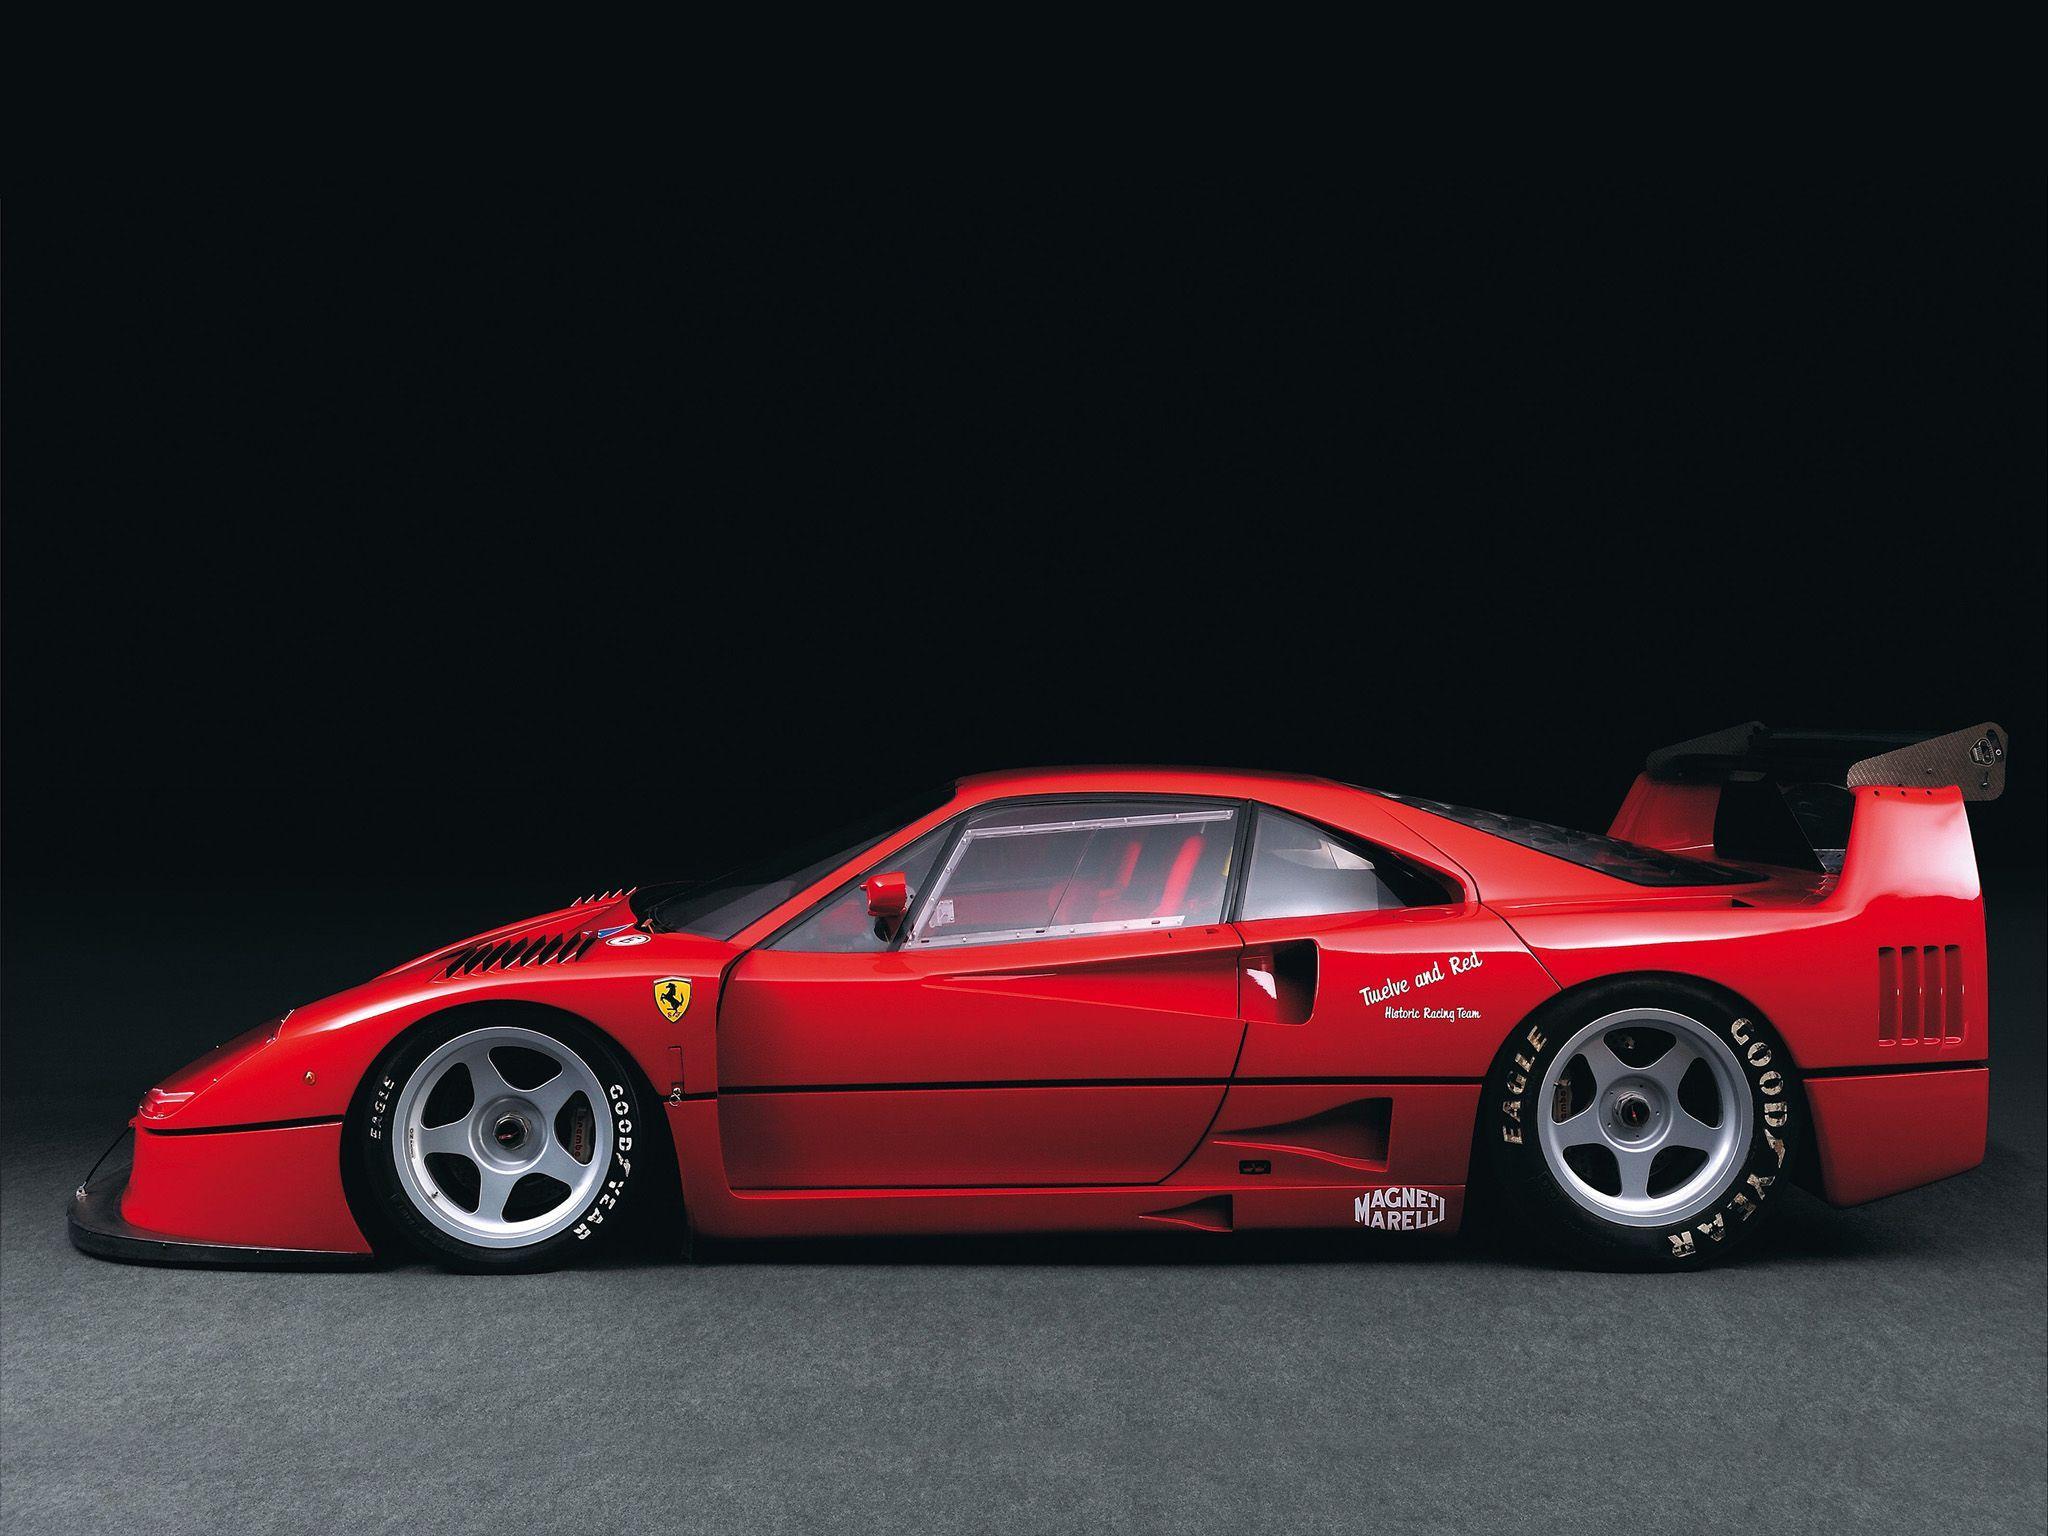 Classic Ferrari Wallpapers , Top Free Classic Ferrari